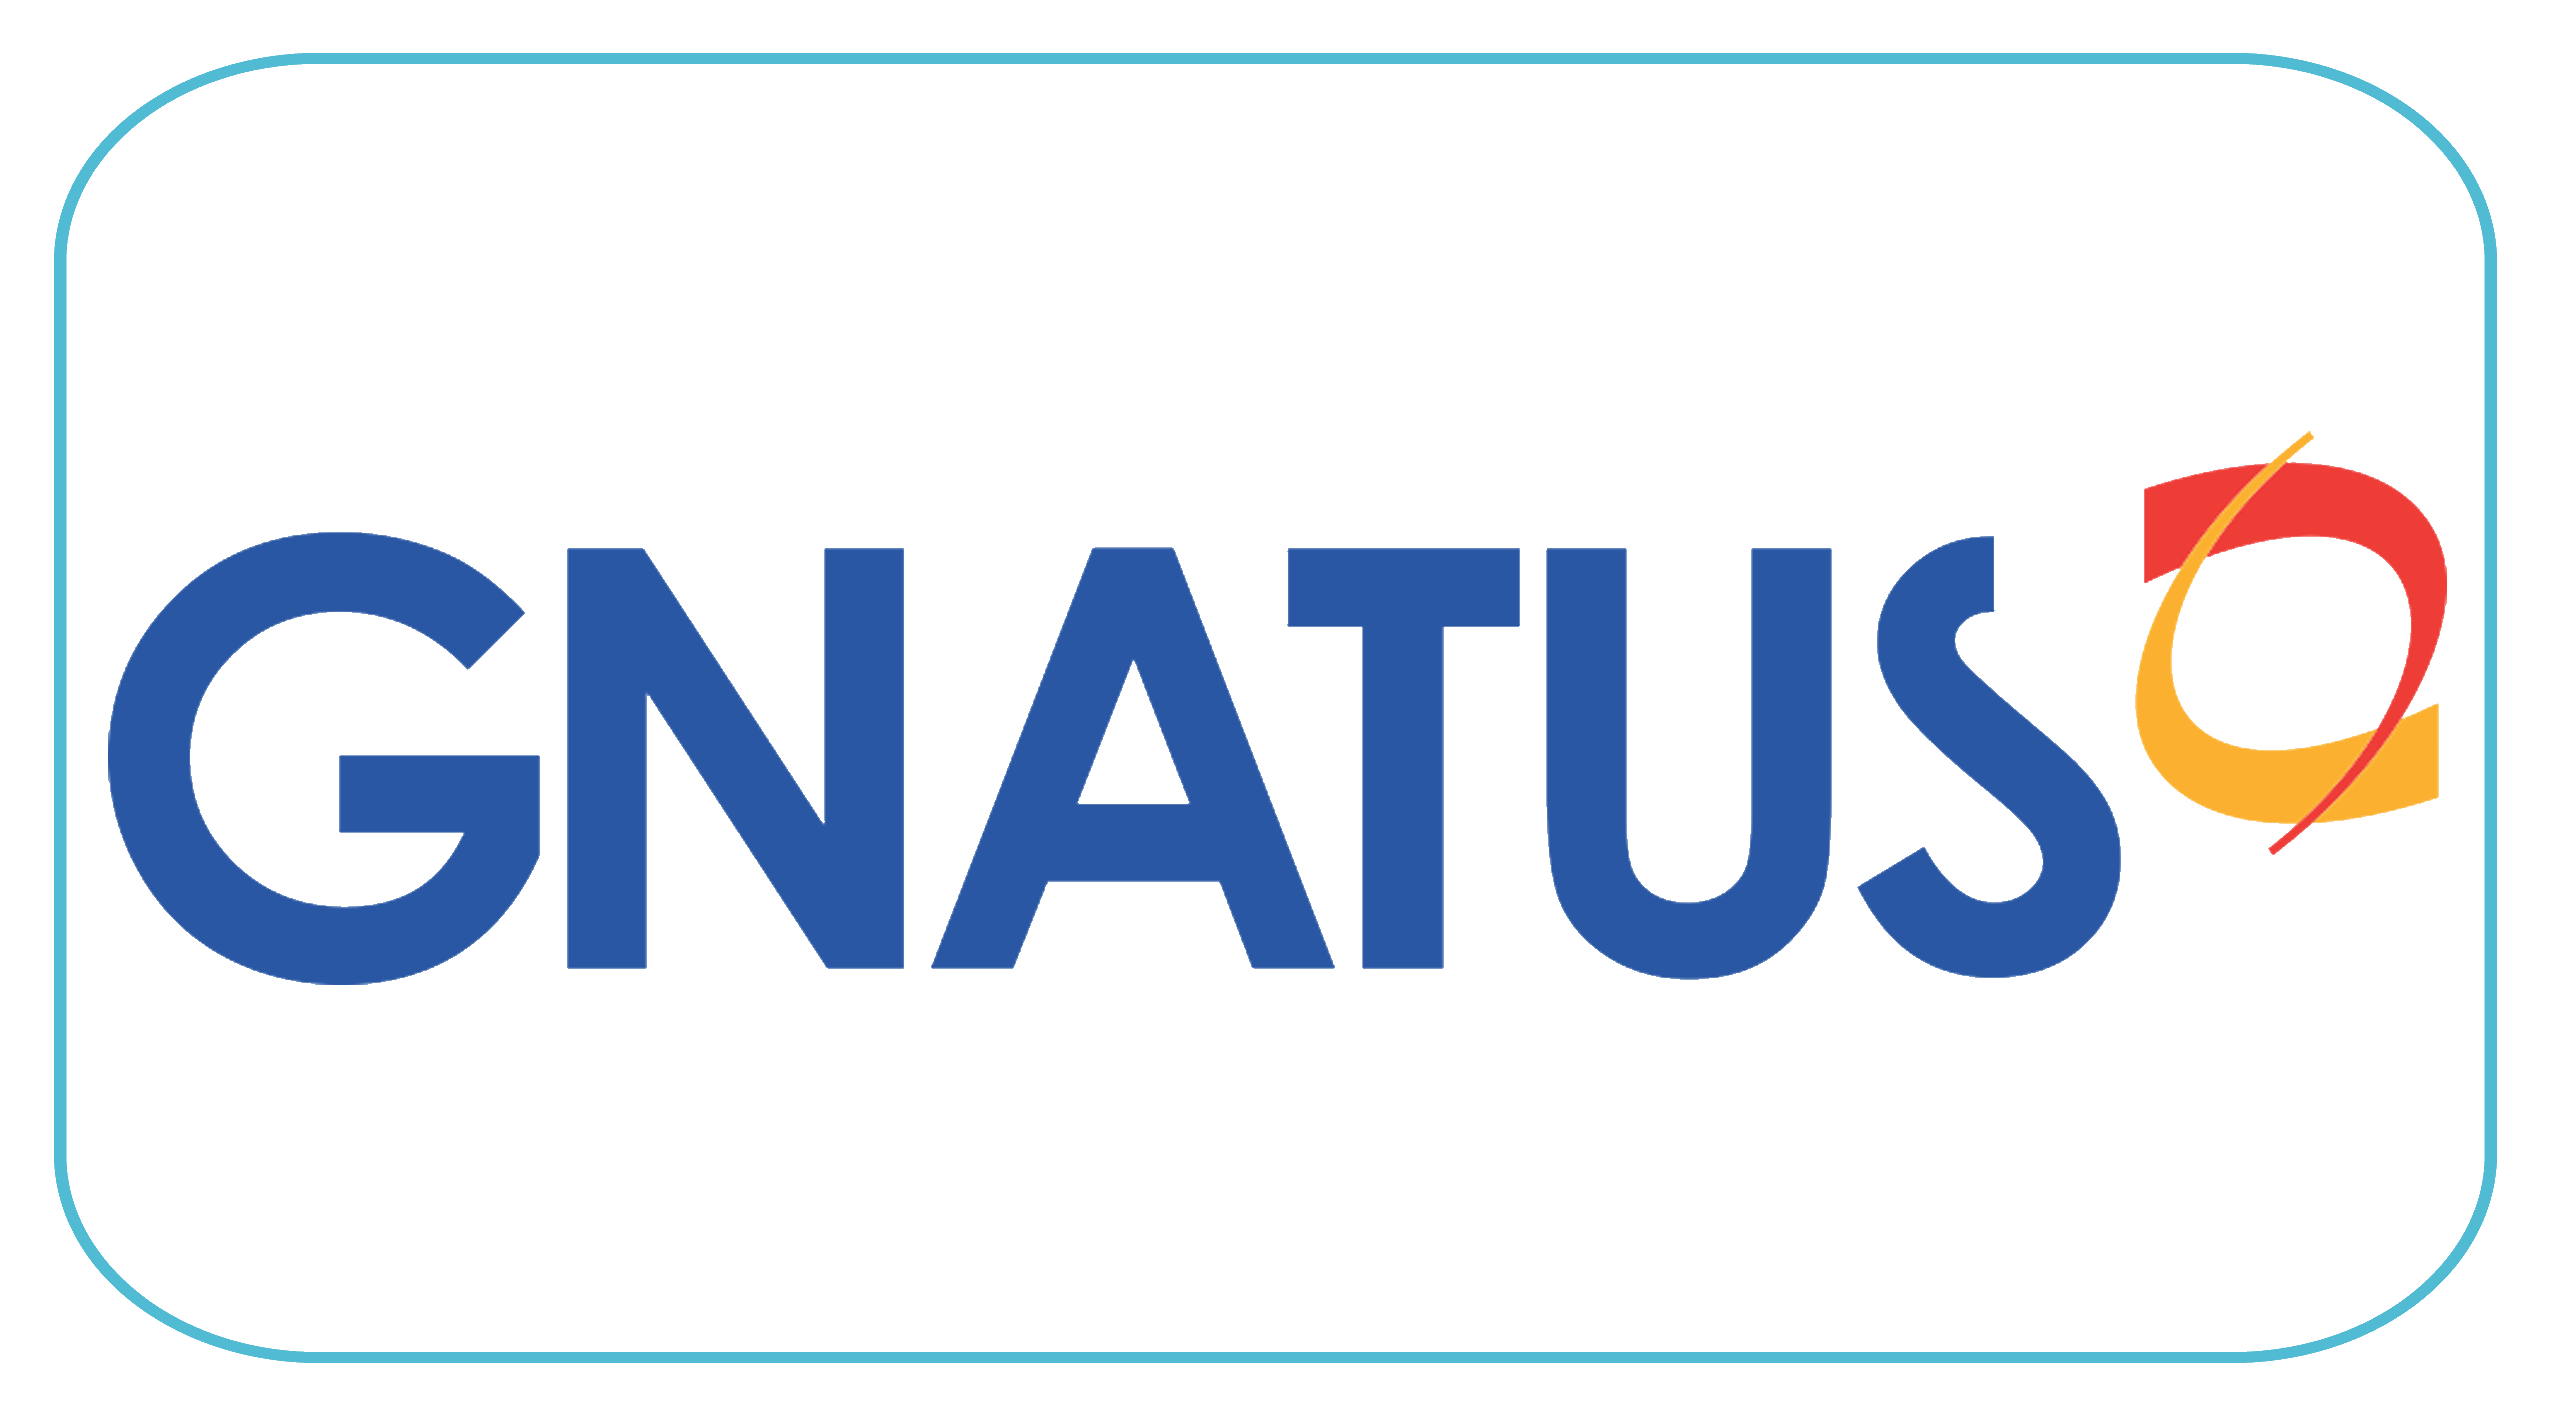 Gnatus- Brasil - Consultorios odontologicos